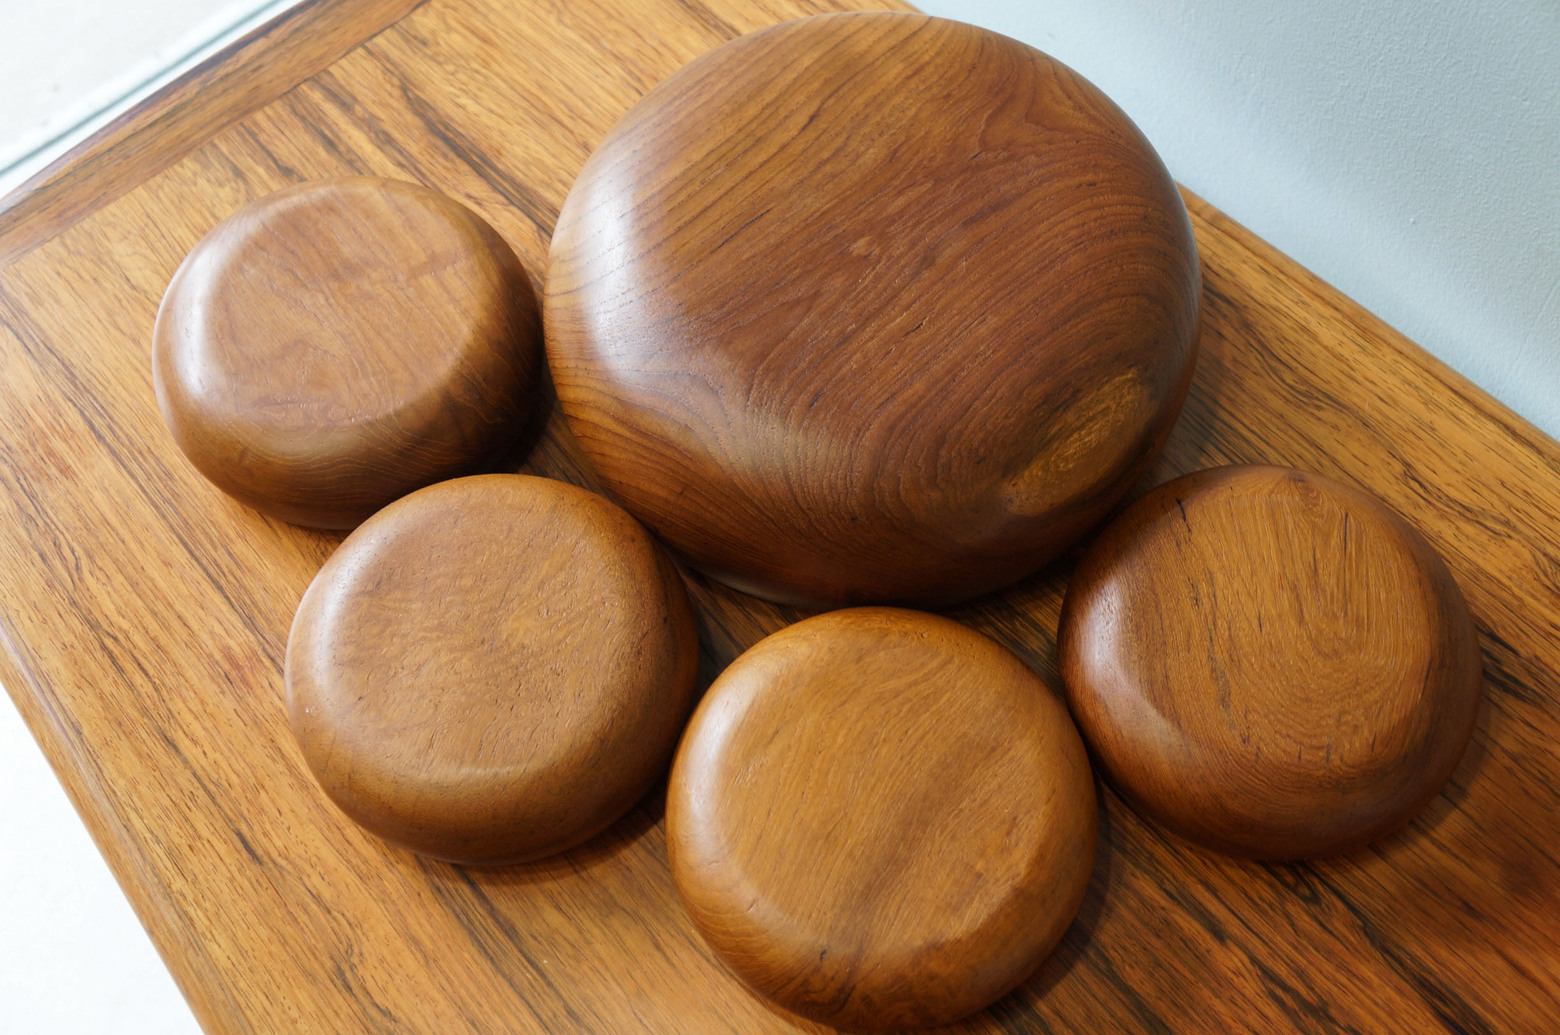 Vintage Teakwood Bowl Set/チークウッド ボウル セット ヴィンテージ食器 北欧スタイル インテリア